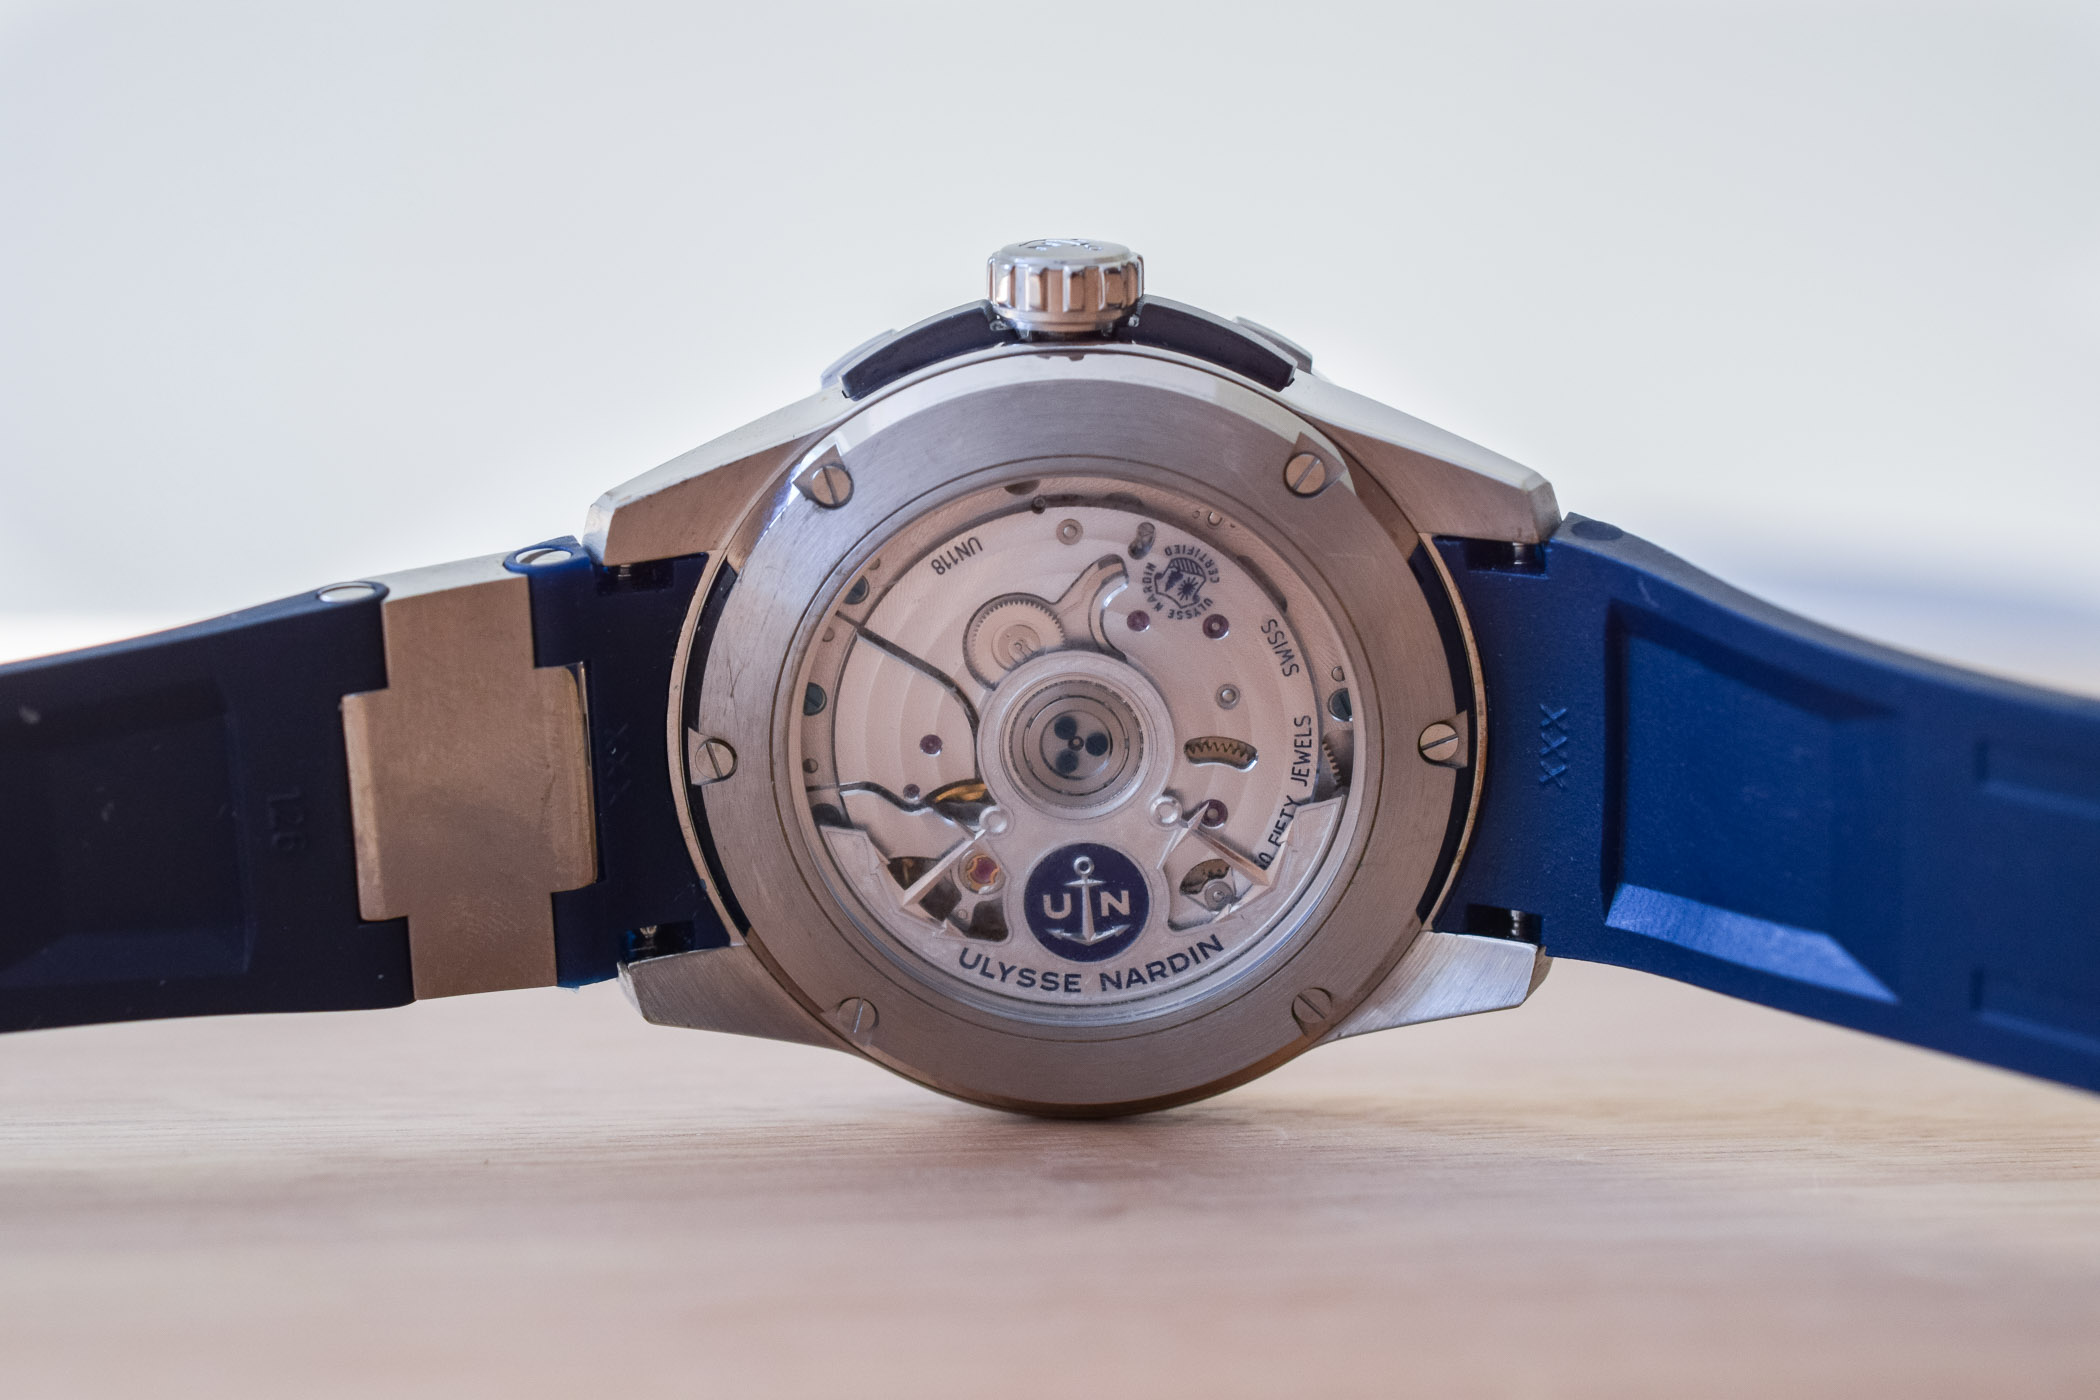 2018 Ulysse Nardin Diver Chronometer